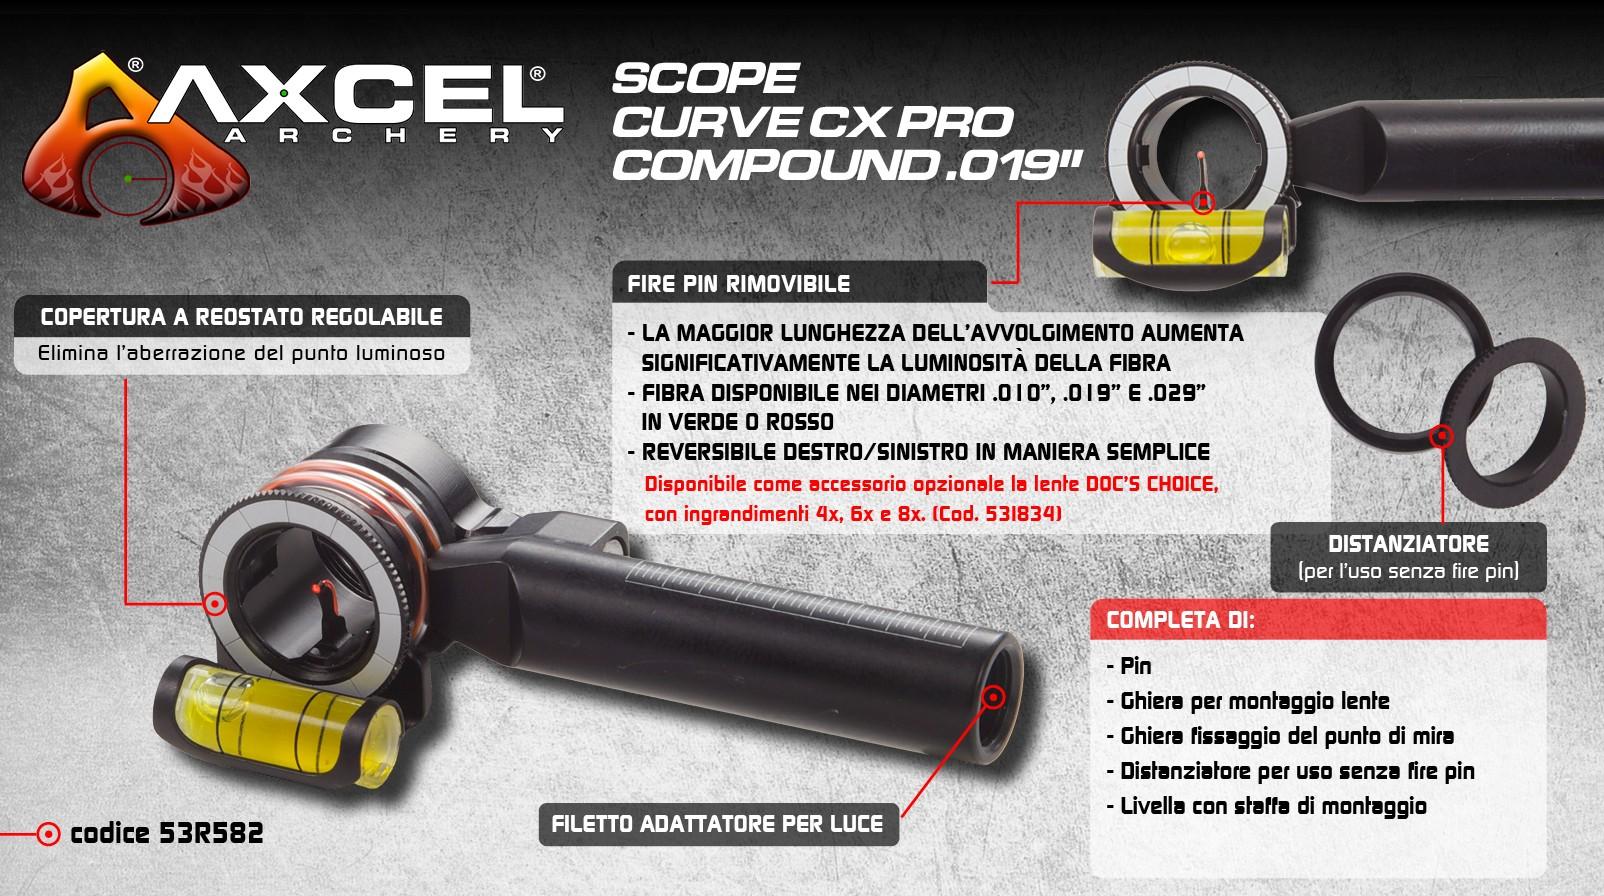 AXCEL DIOTTRA CURVE CX PRO COMPOUND